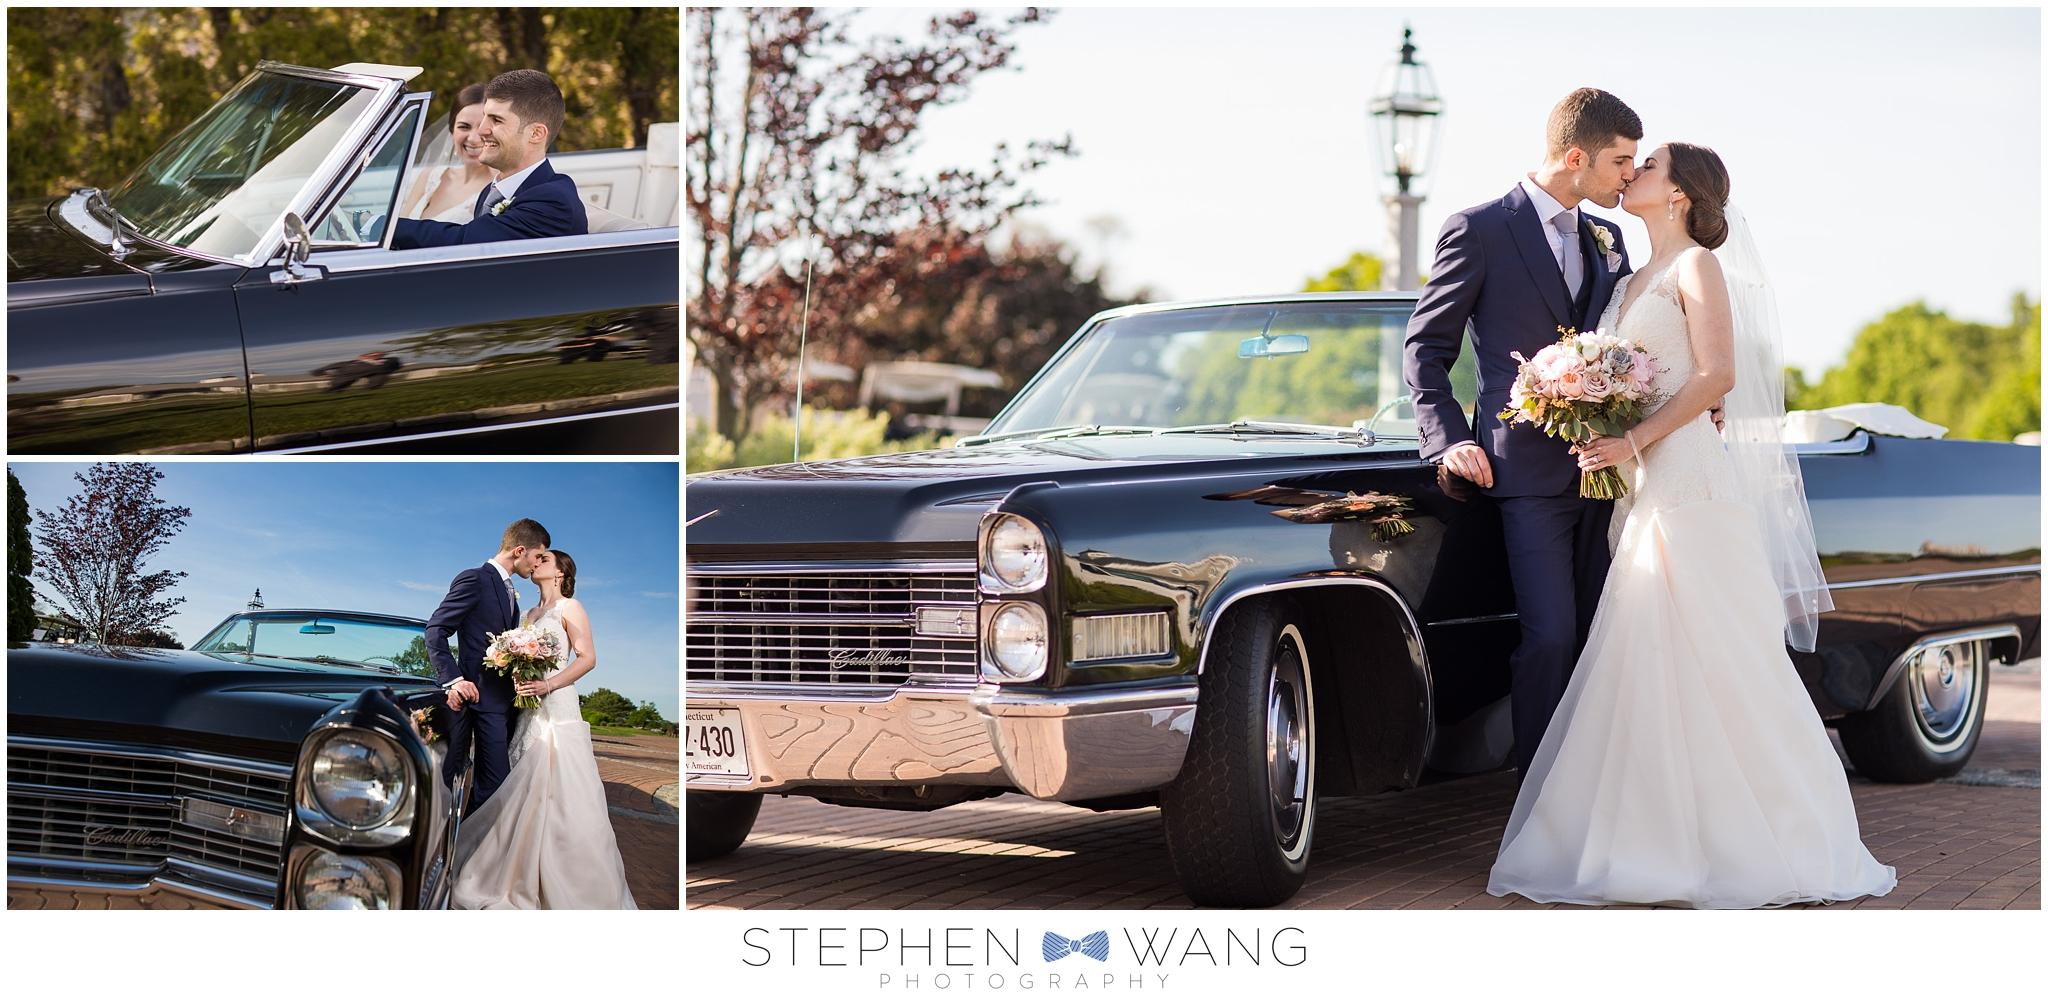 Stephen Wang Photography Shorehaven Norwalk CT Wedding Photographer connecticut shoreline shore haven - 25.jpg